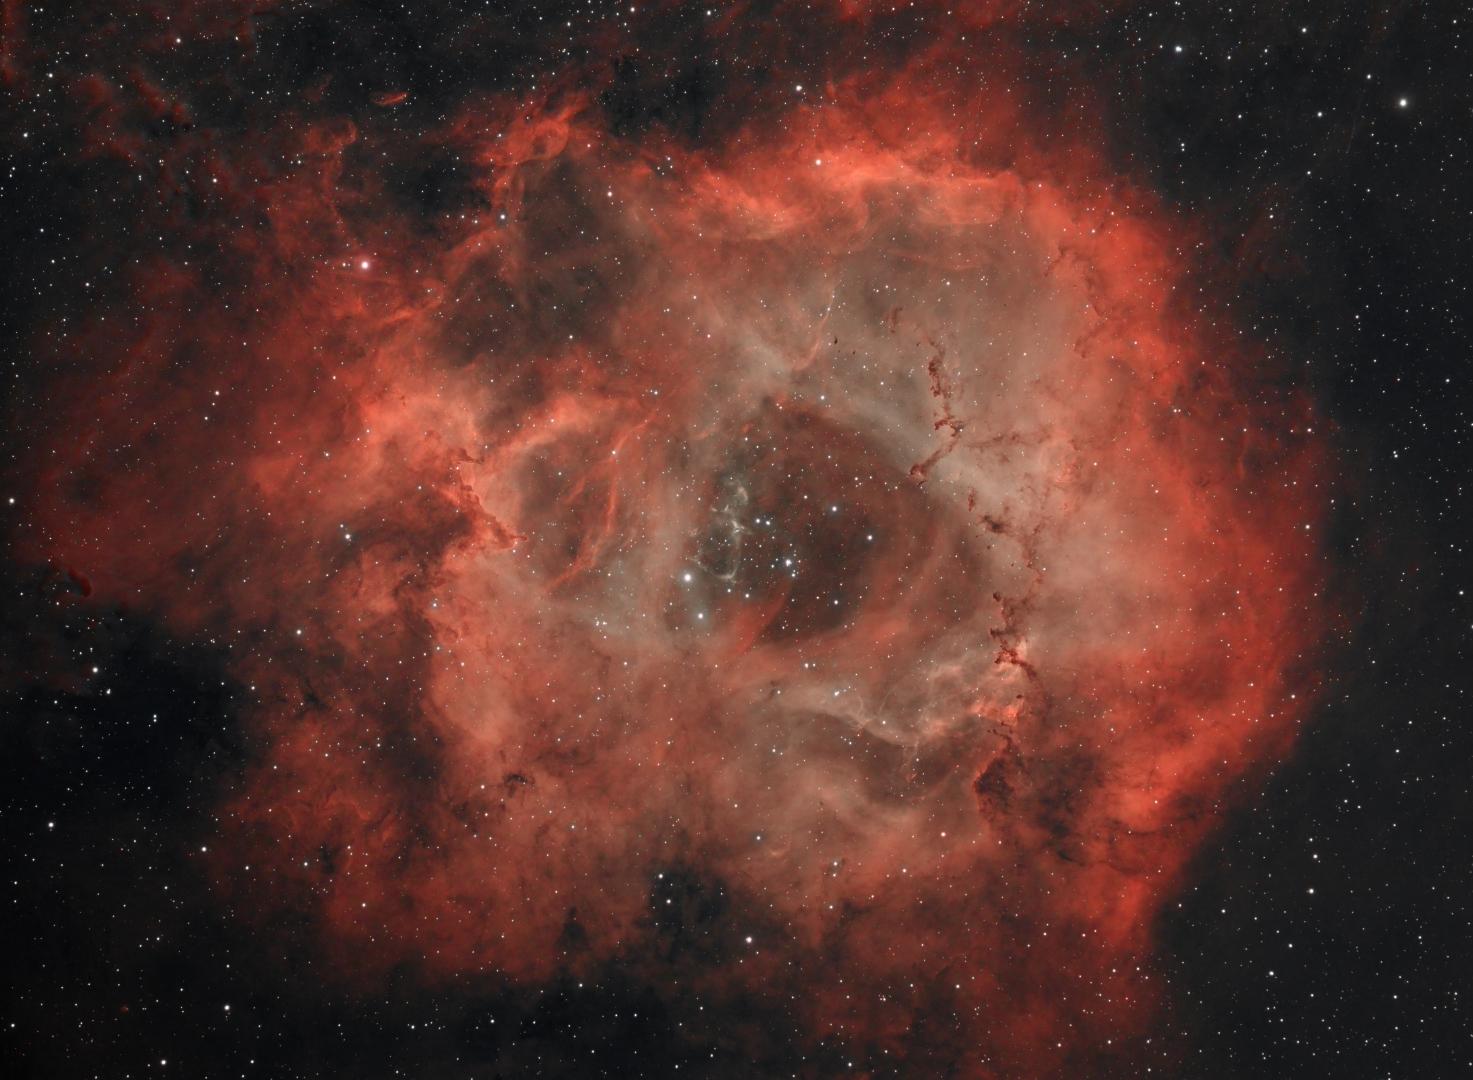 2021_02_21 - NGC2244_Ha-RGB_klein.jpg